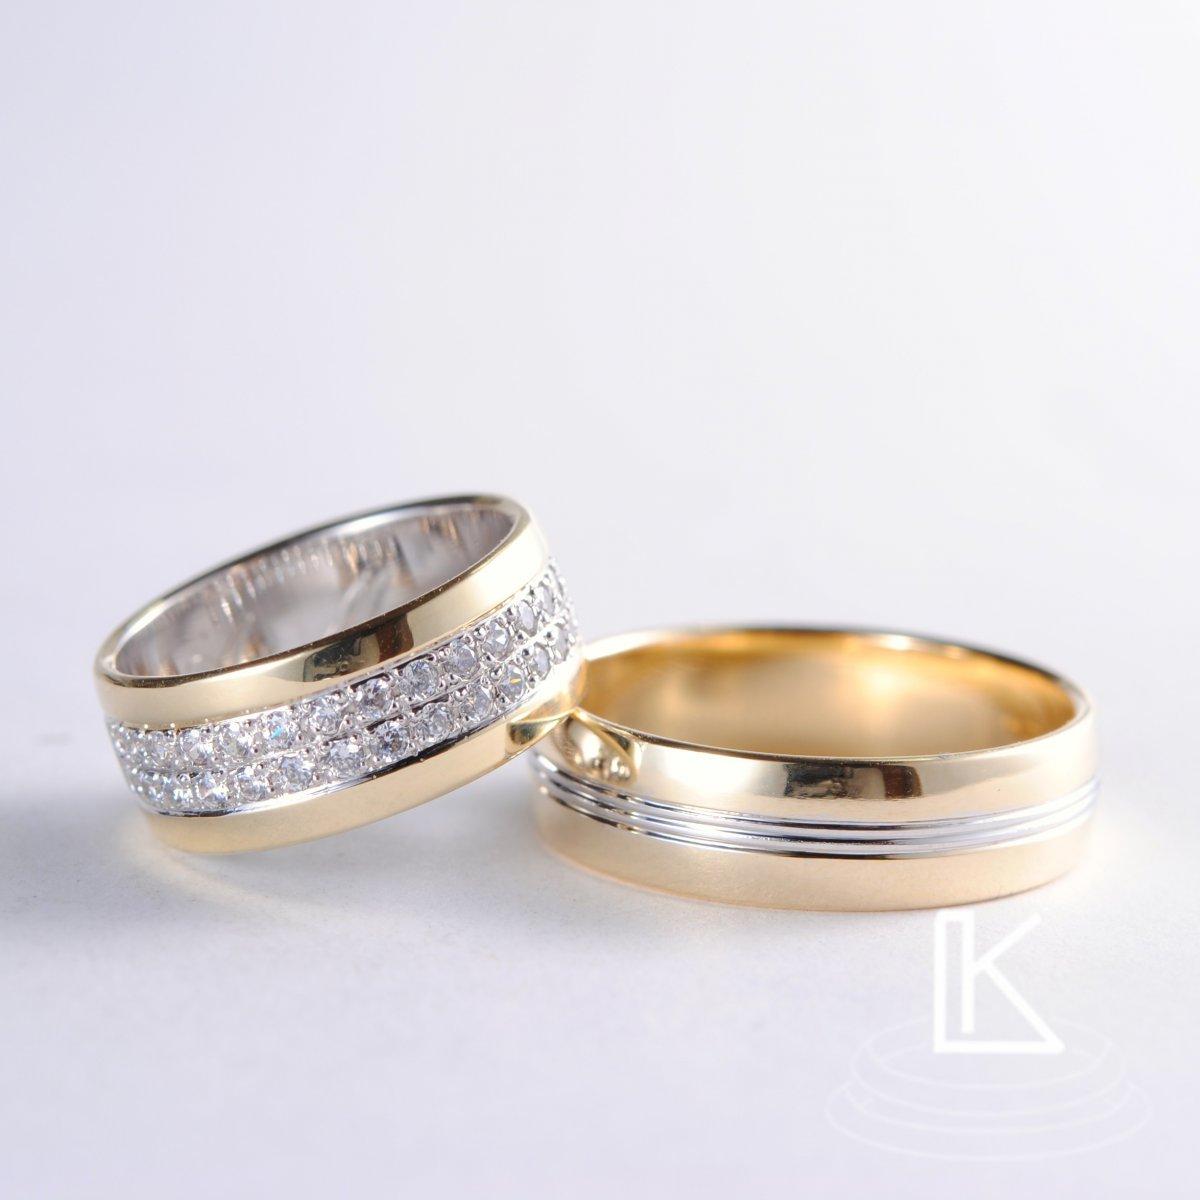 Wedding Rings With Two Rows Of Zircons Ladislav Kouril